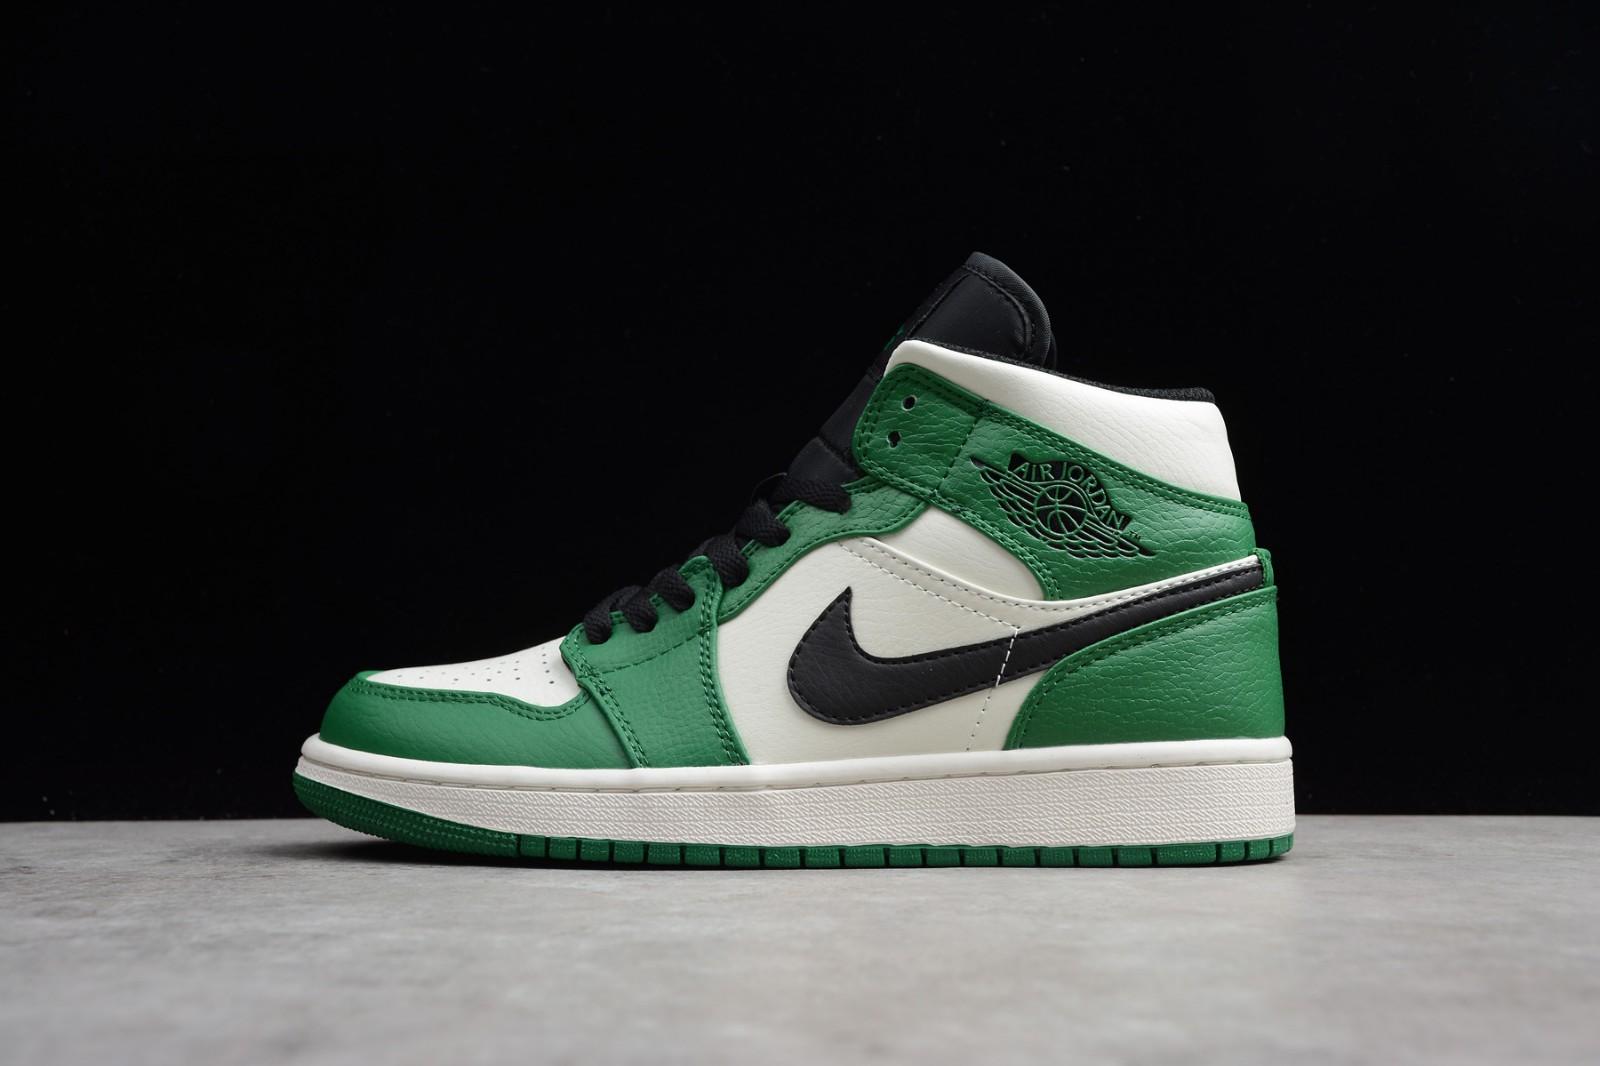 timeless design 61f1d fa450 Prev Nike Air Jordan 1 Mid Pine Green 852542-301